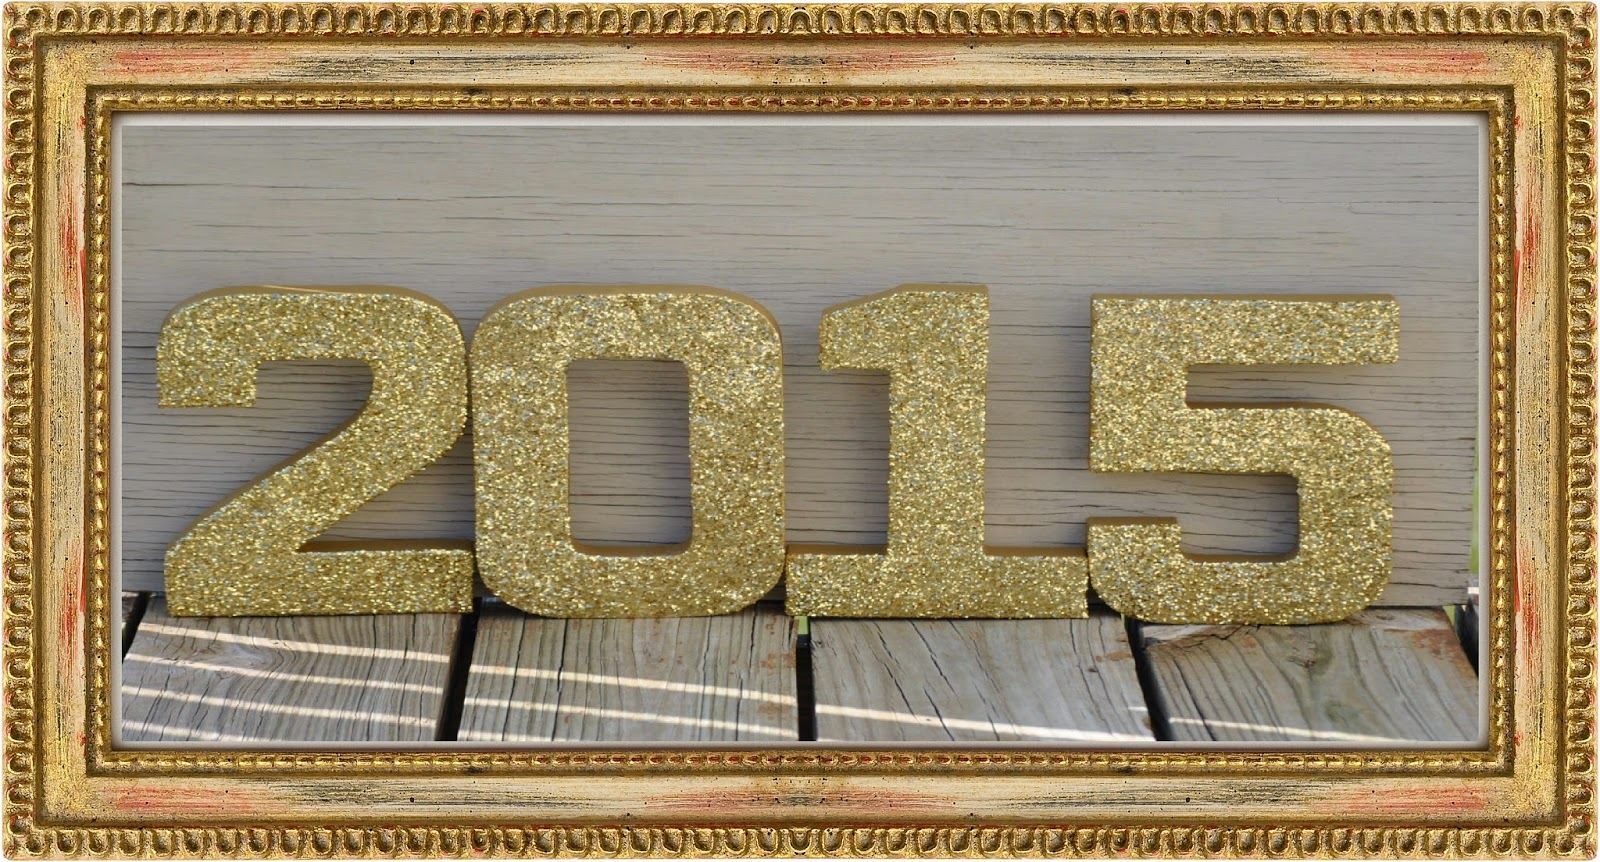 Prossime uscite 2015